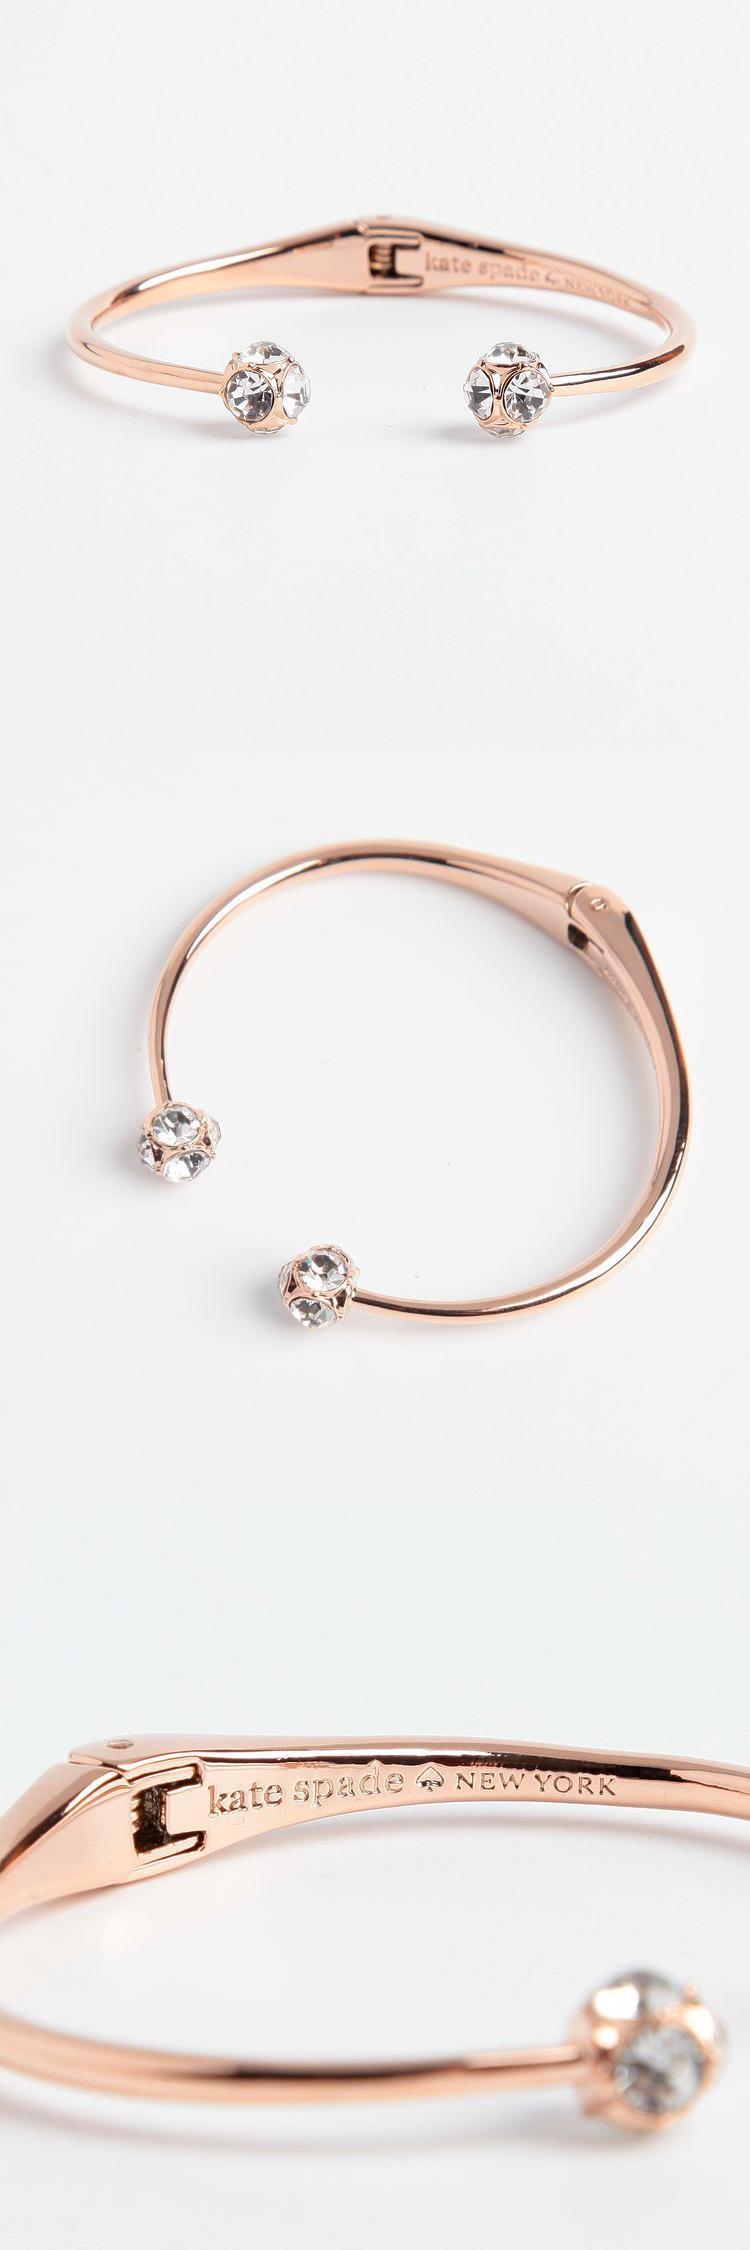 Bracelets 50637 Kate Spade Rose Gold Crystal Hinged Bangle Cuff Bracelet New